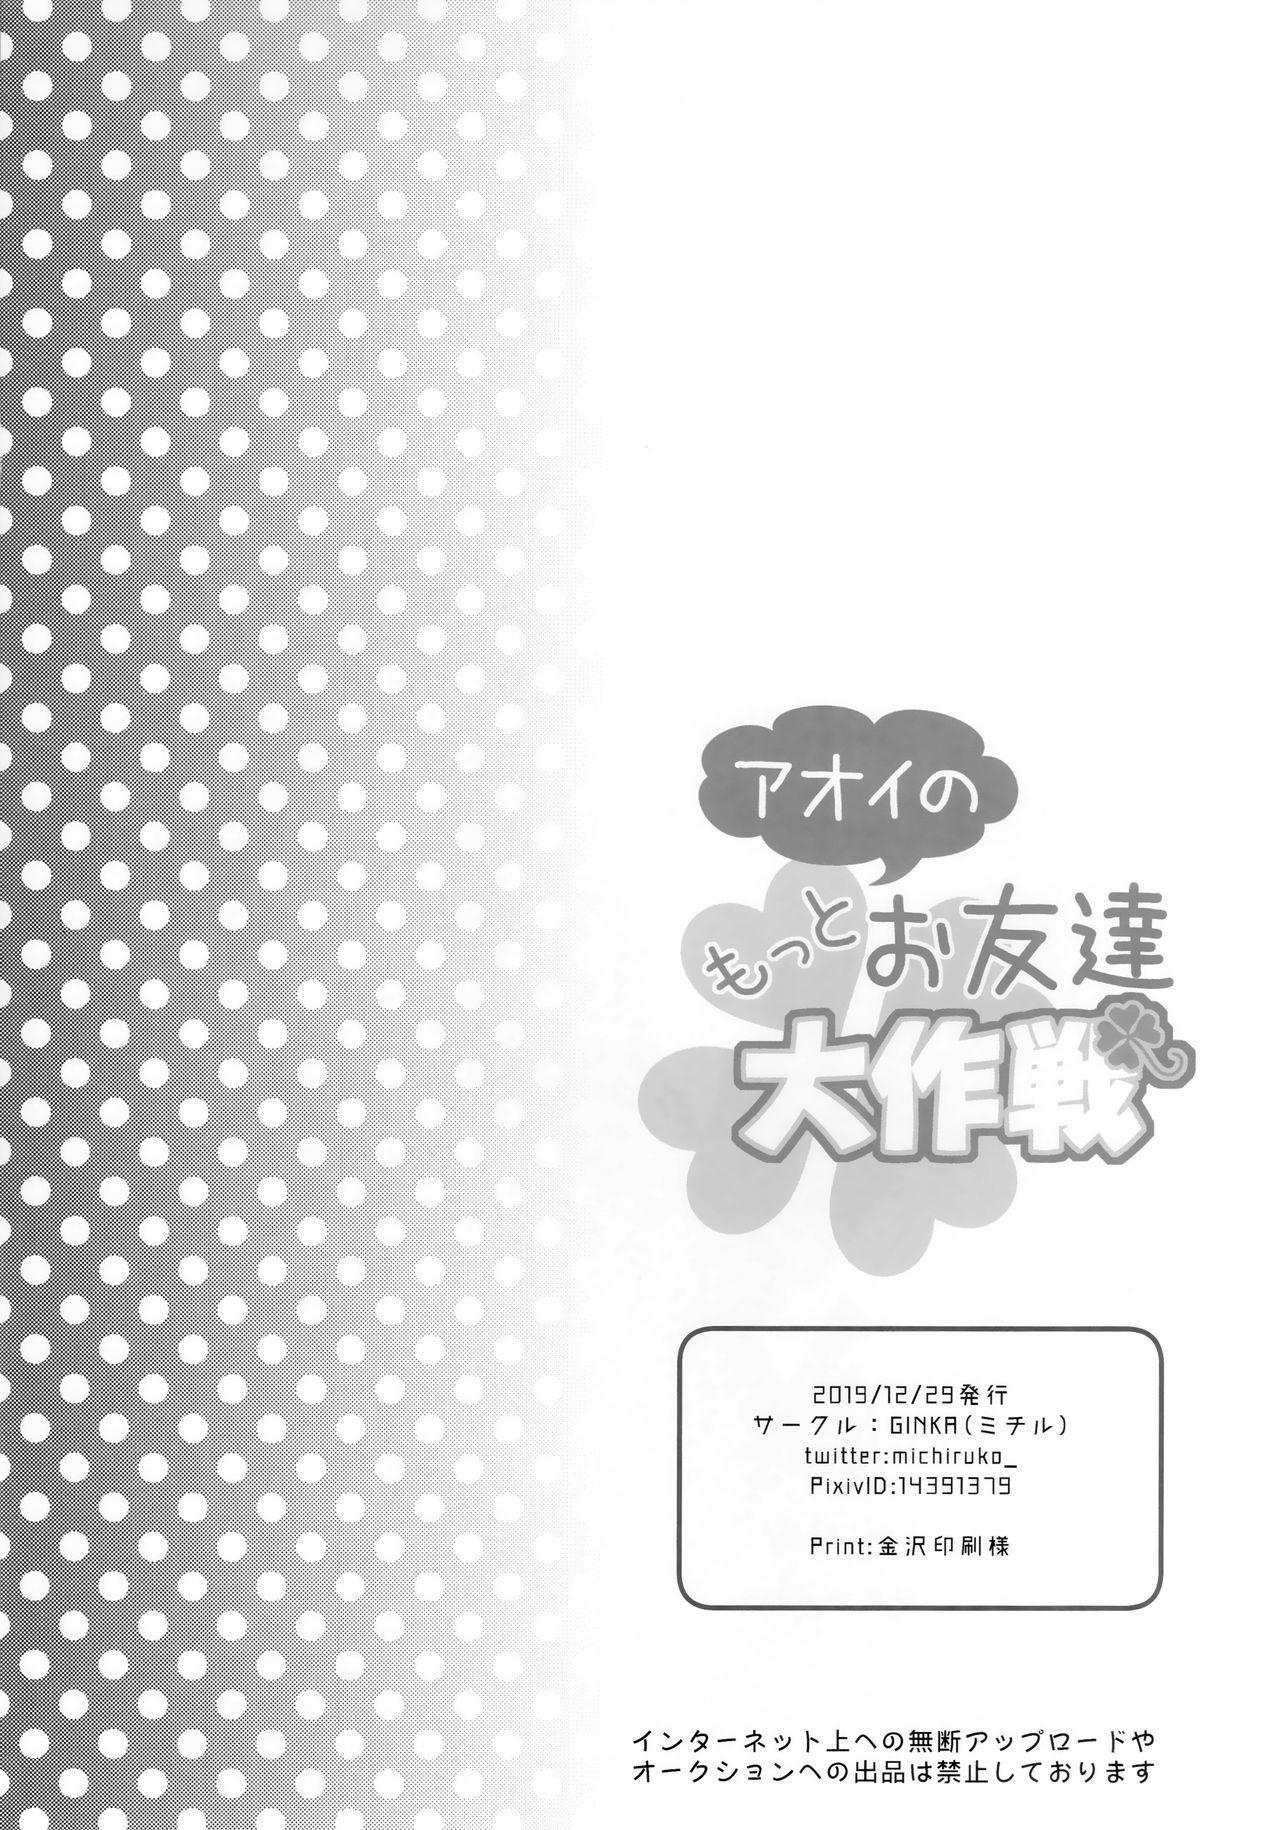 Aoi no Motto Otomodachi Daisakusen 22